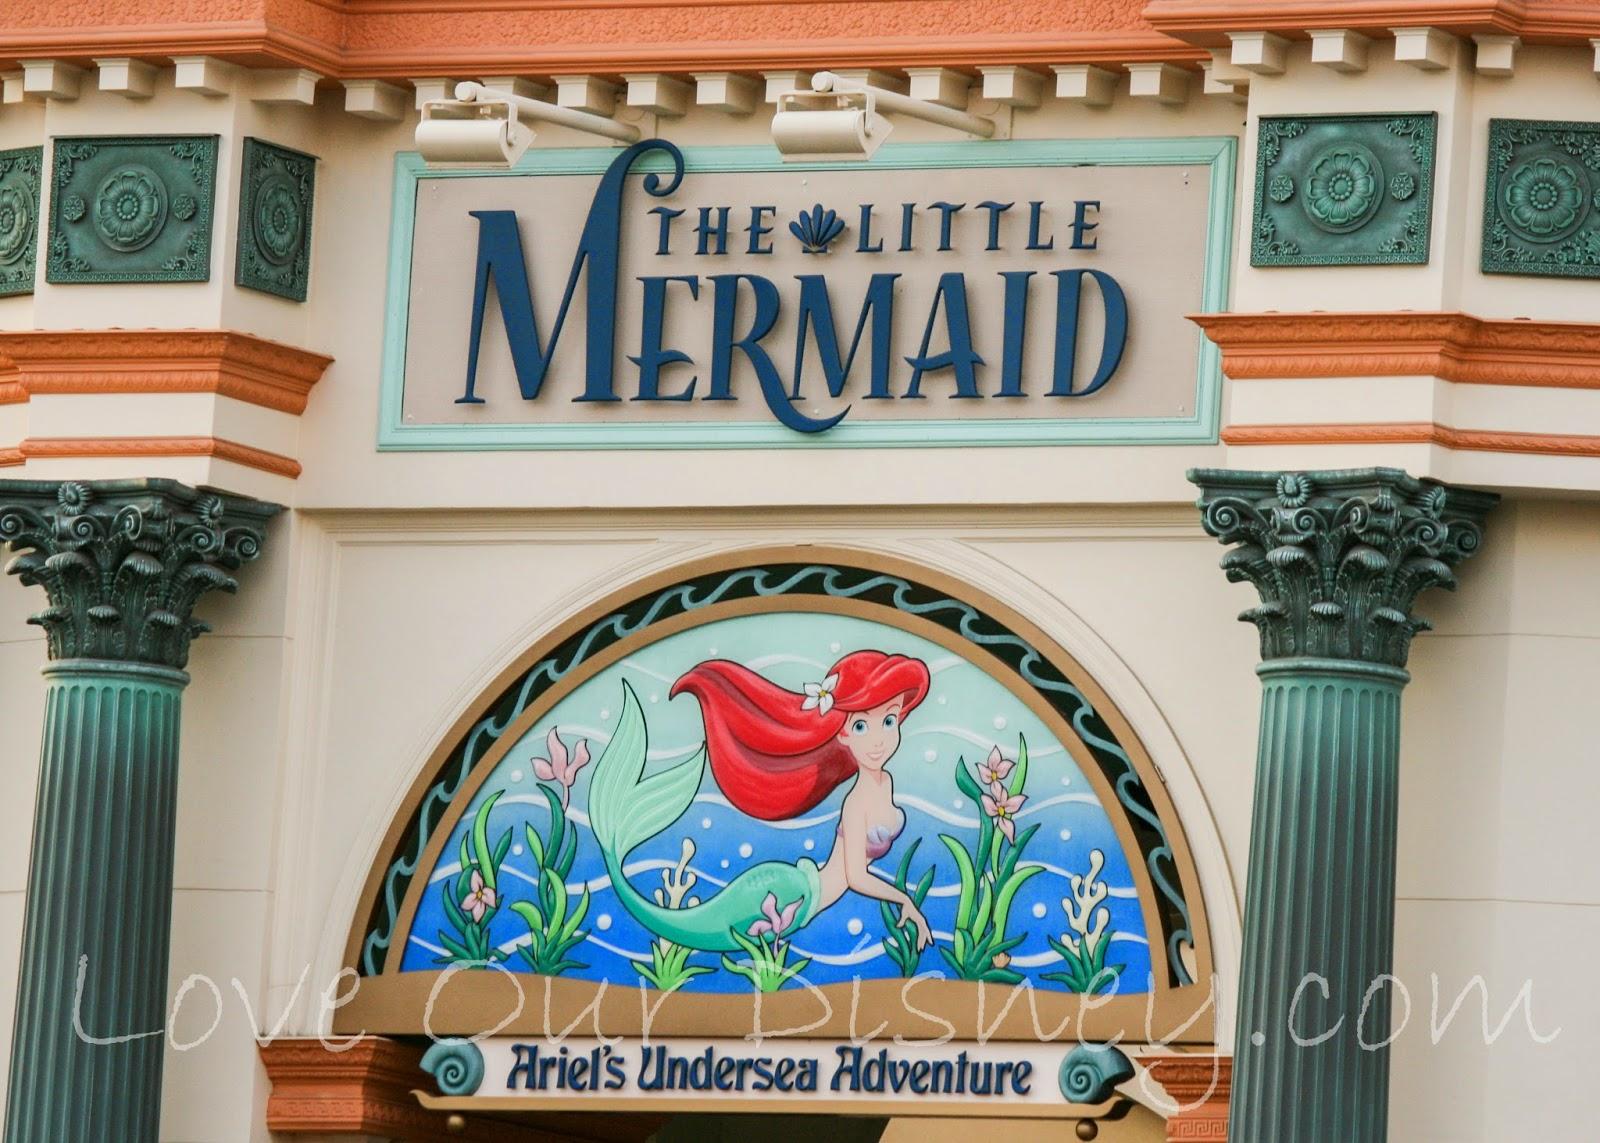 Best rides for Preschoolers at Disneyland Resort. LoveOurDisney.com